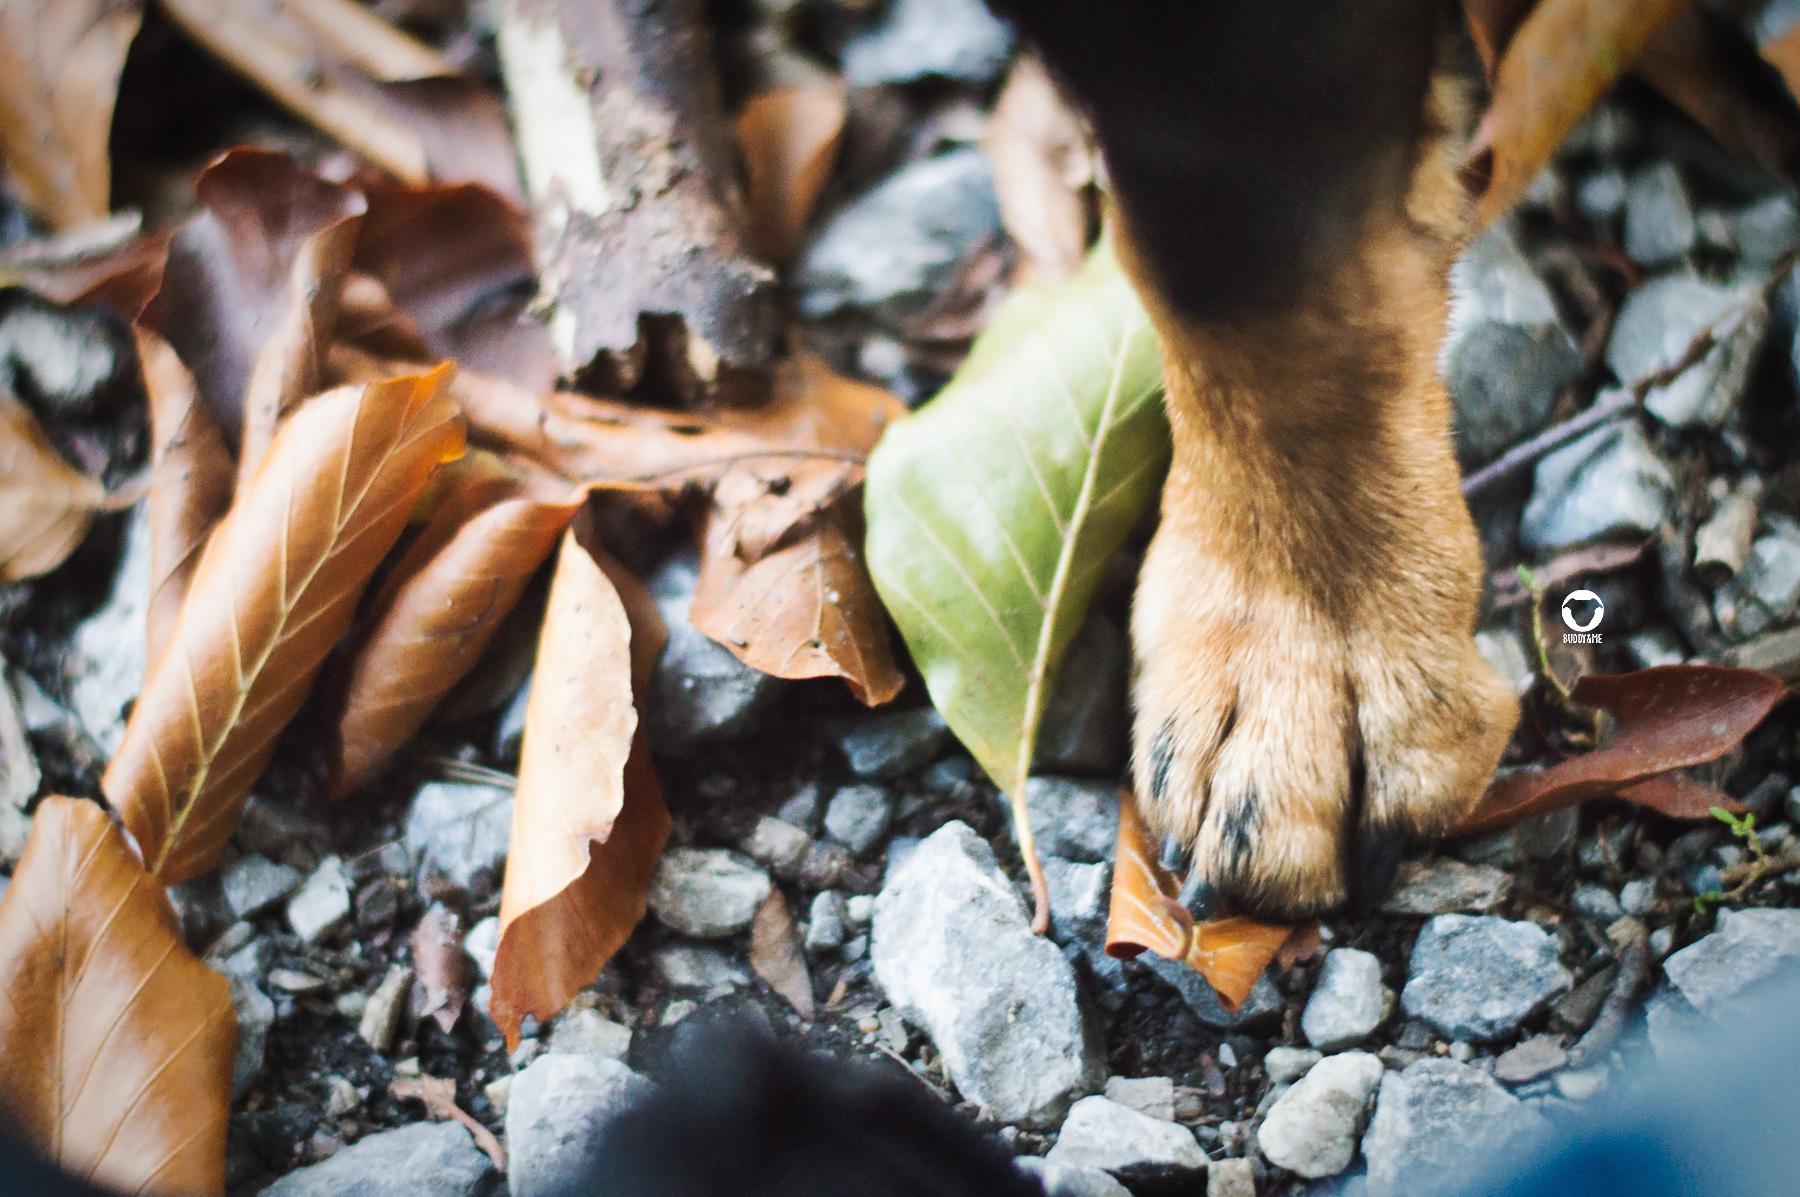 Pinscher Buddy, Buddy and Me, Dogblog, Hundeblog, Ruhrgebiet, Herbst, Wald, Laub, Herbstspaziergang